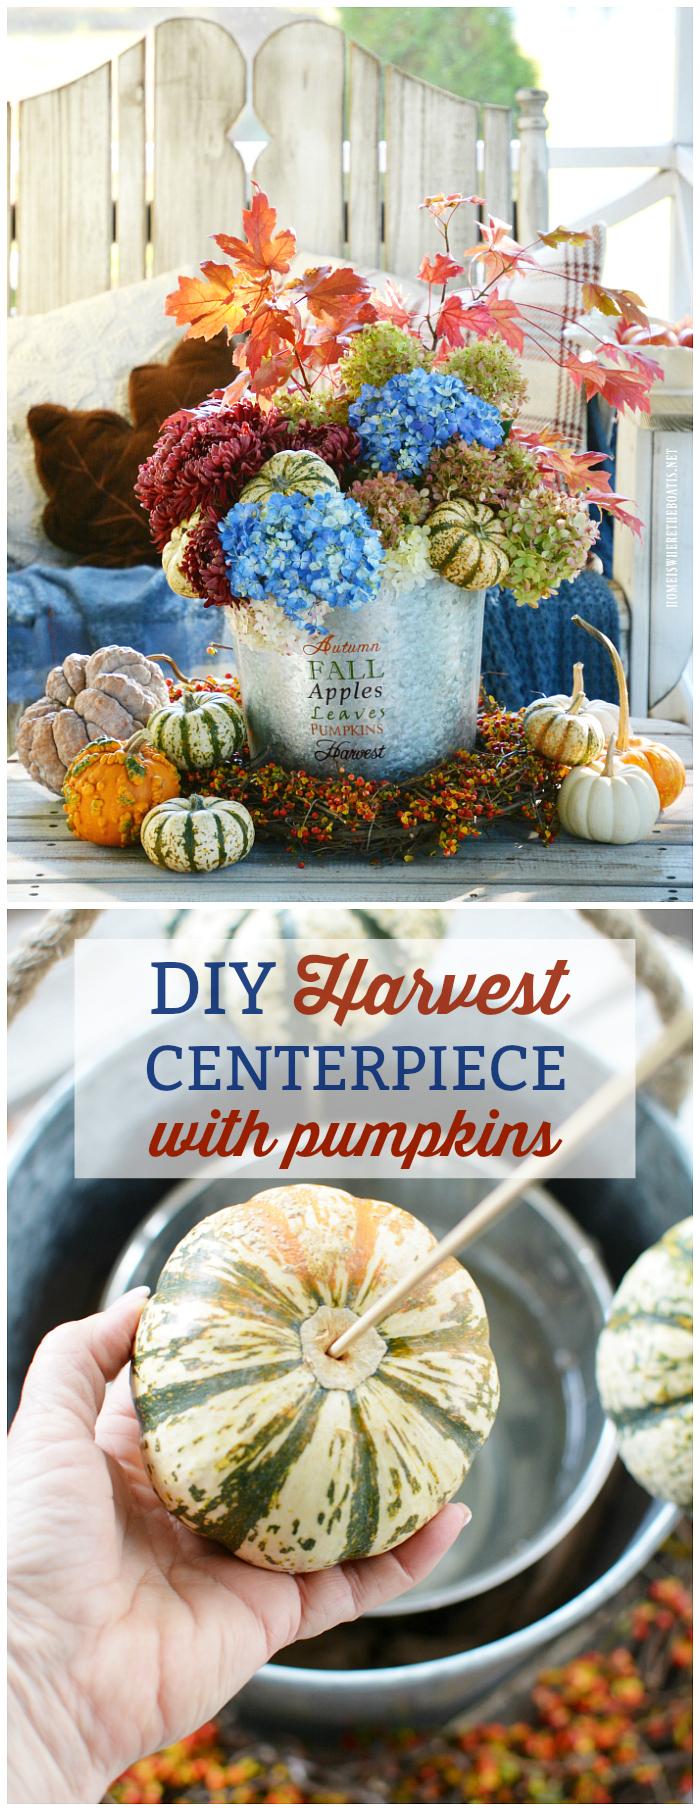 DIY Autumn Harvest Centerpiece in galvanized bucket with hydrangeas and tiger striped pumpkins, framed with a bittersweet vine wreath | ©homeiswheretheboatis.net #flowerarranging #fall #autumn #pumpkins #hydrangeas #DIY